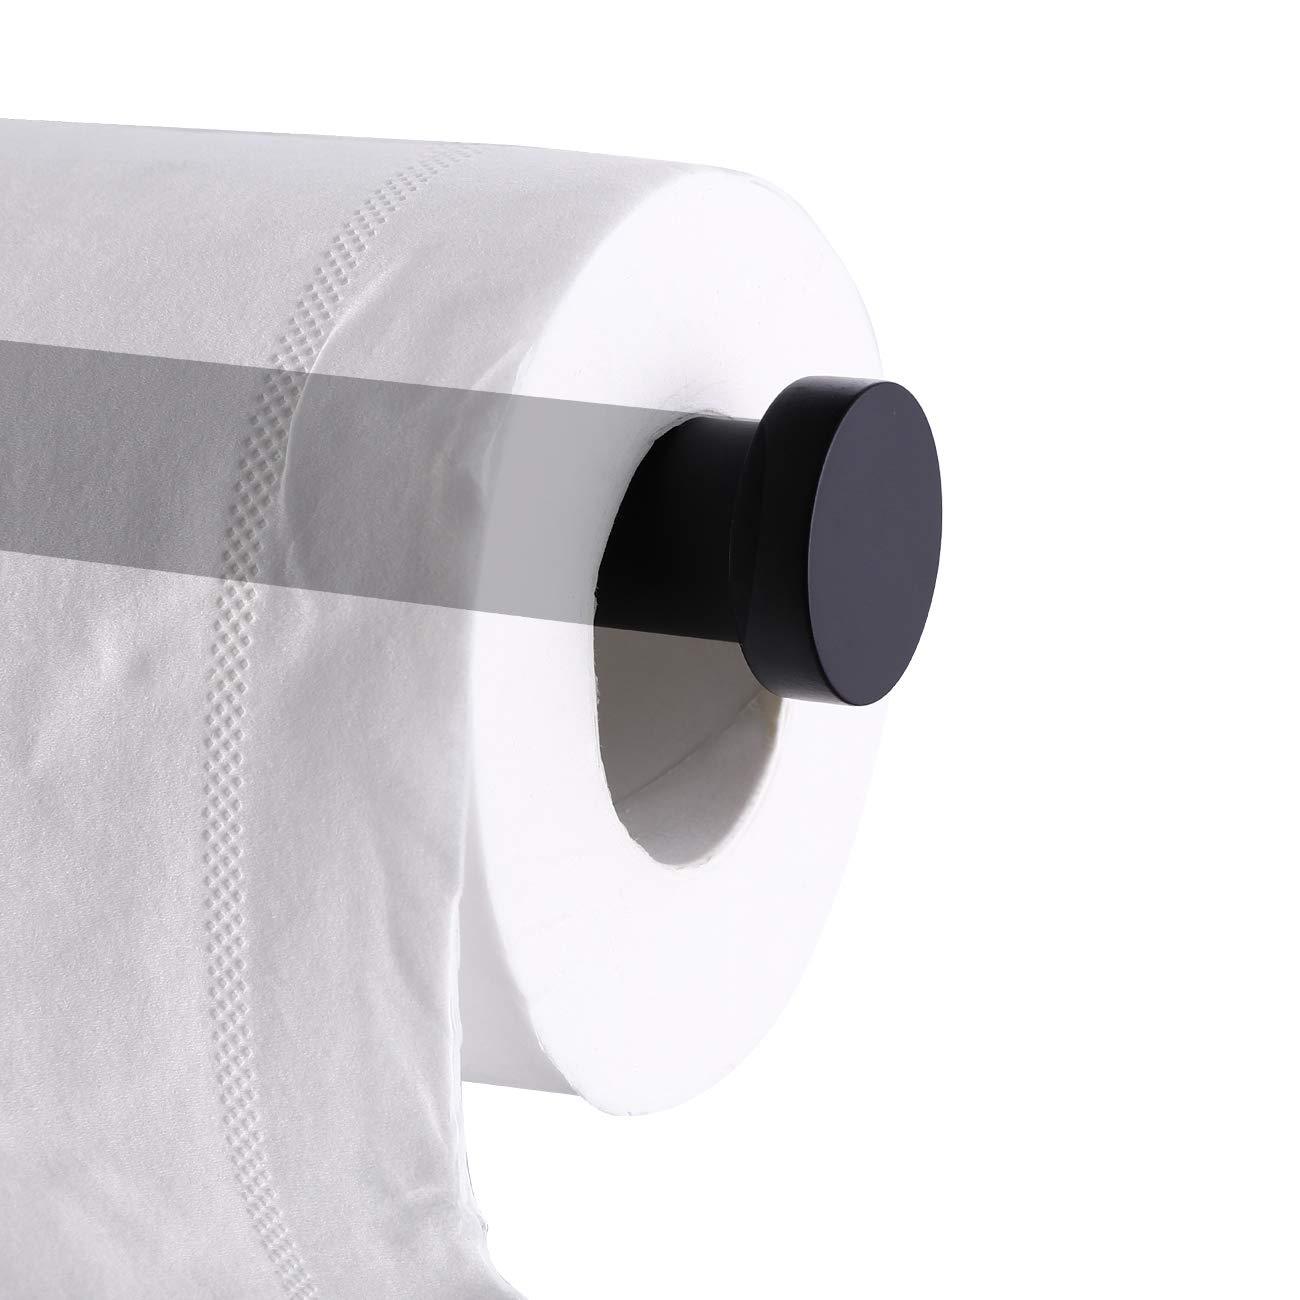 Amazon.com: KES BPH212-P - Soporte de papel higiénico doble ...